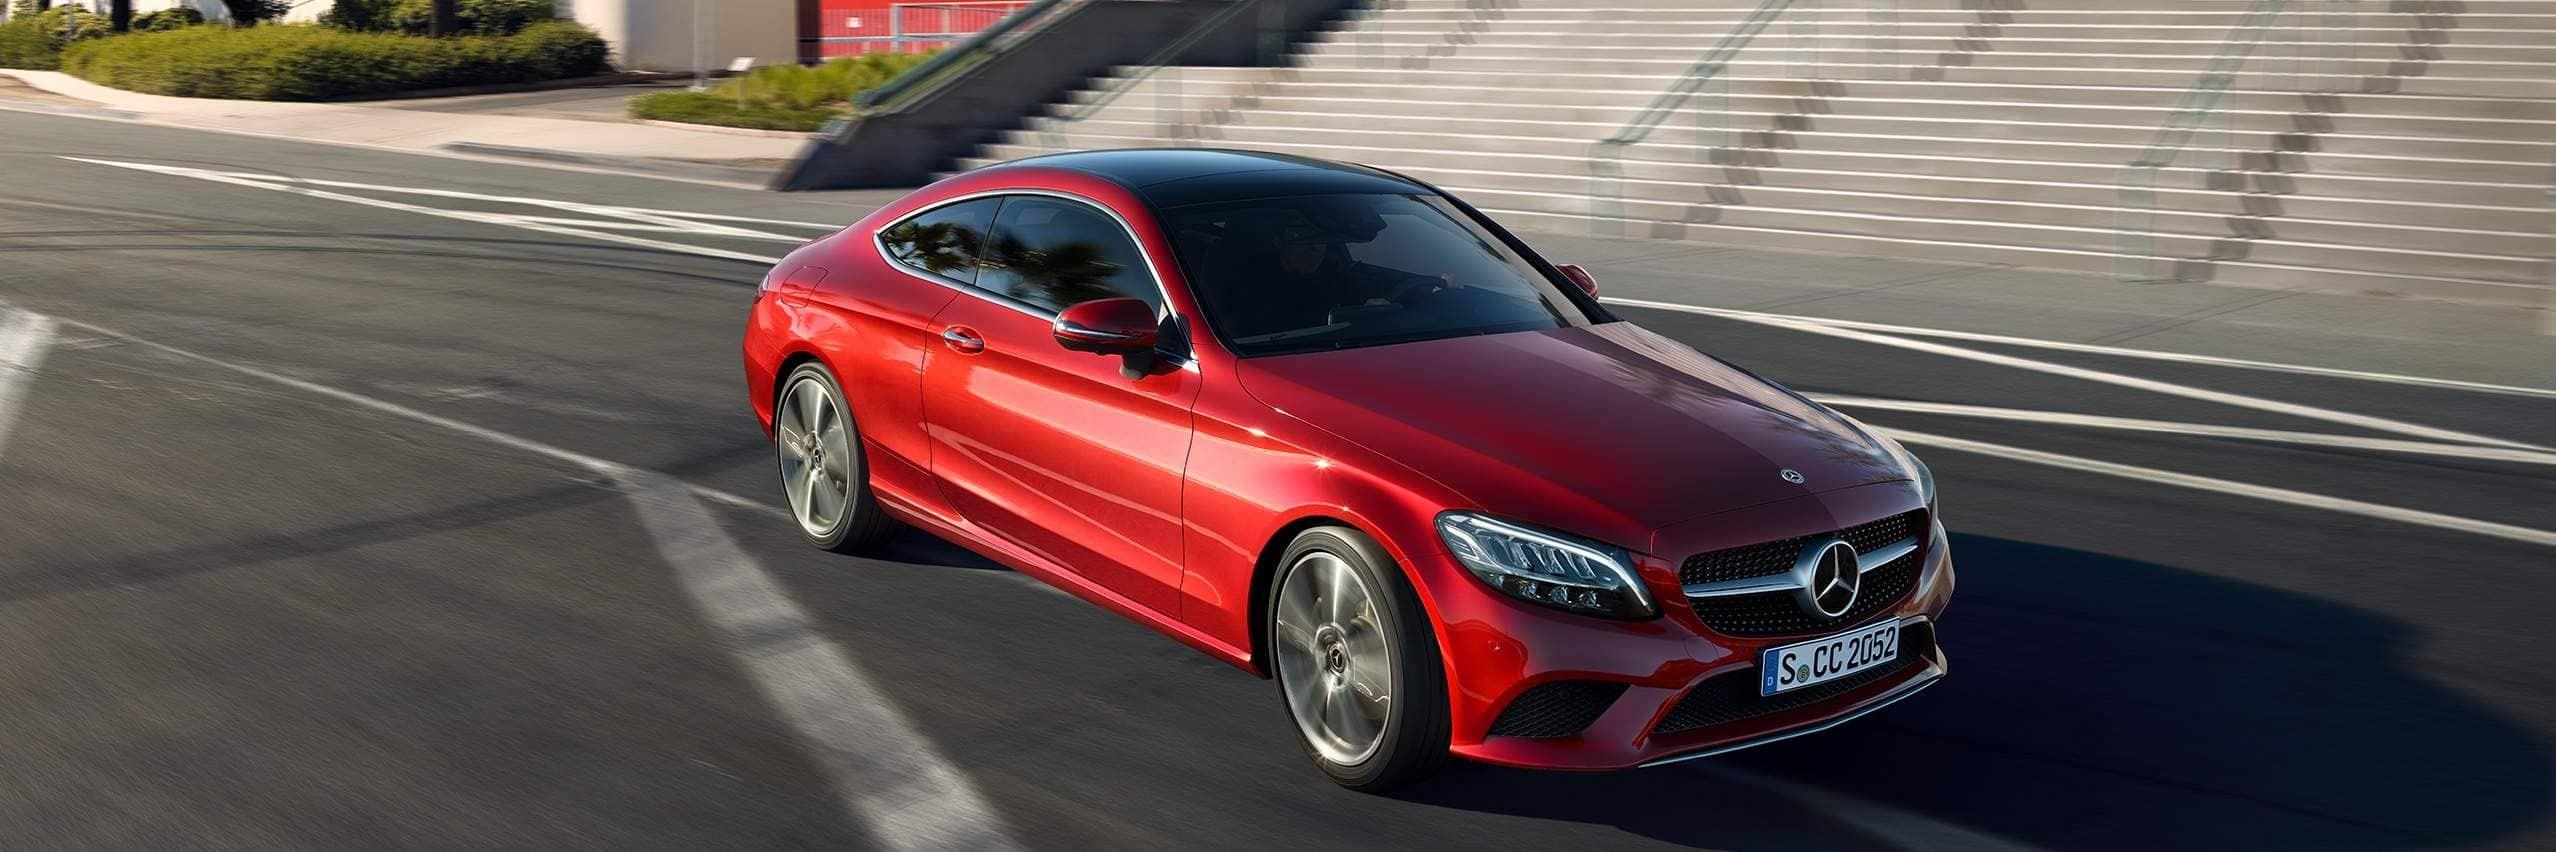 ТехнологииMercedes–Benz C–Class Coupe